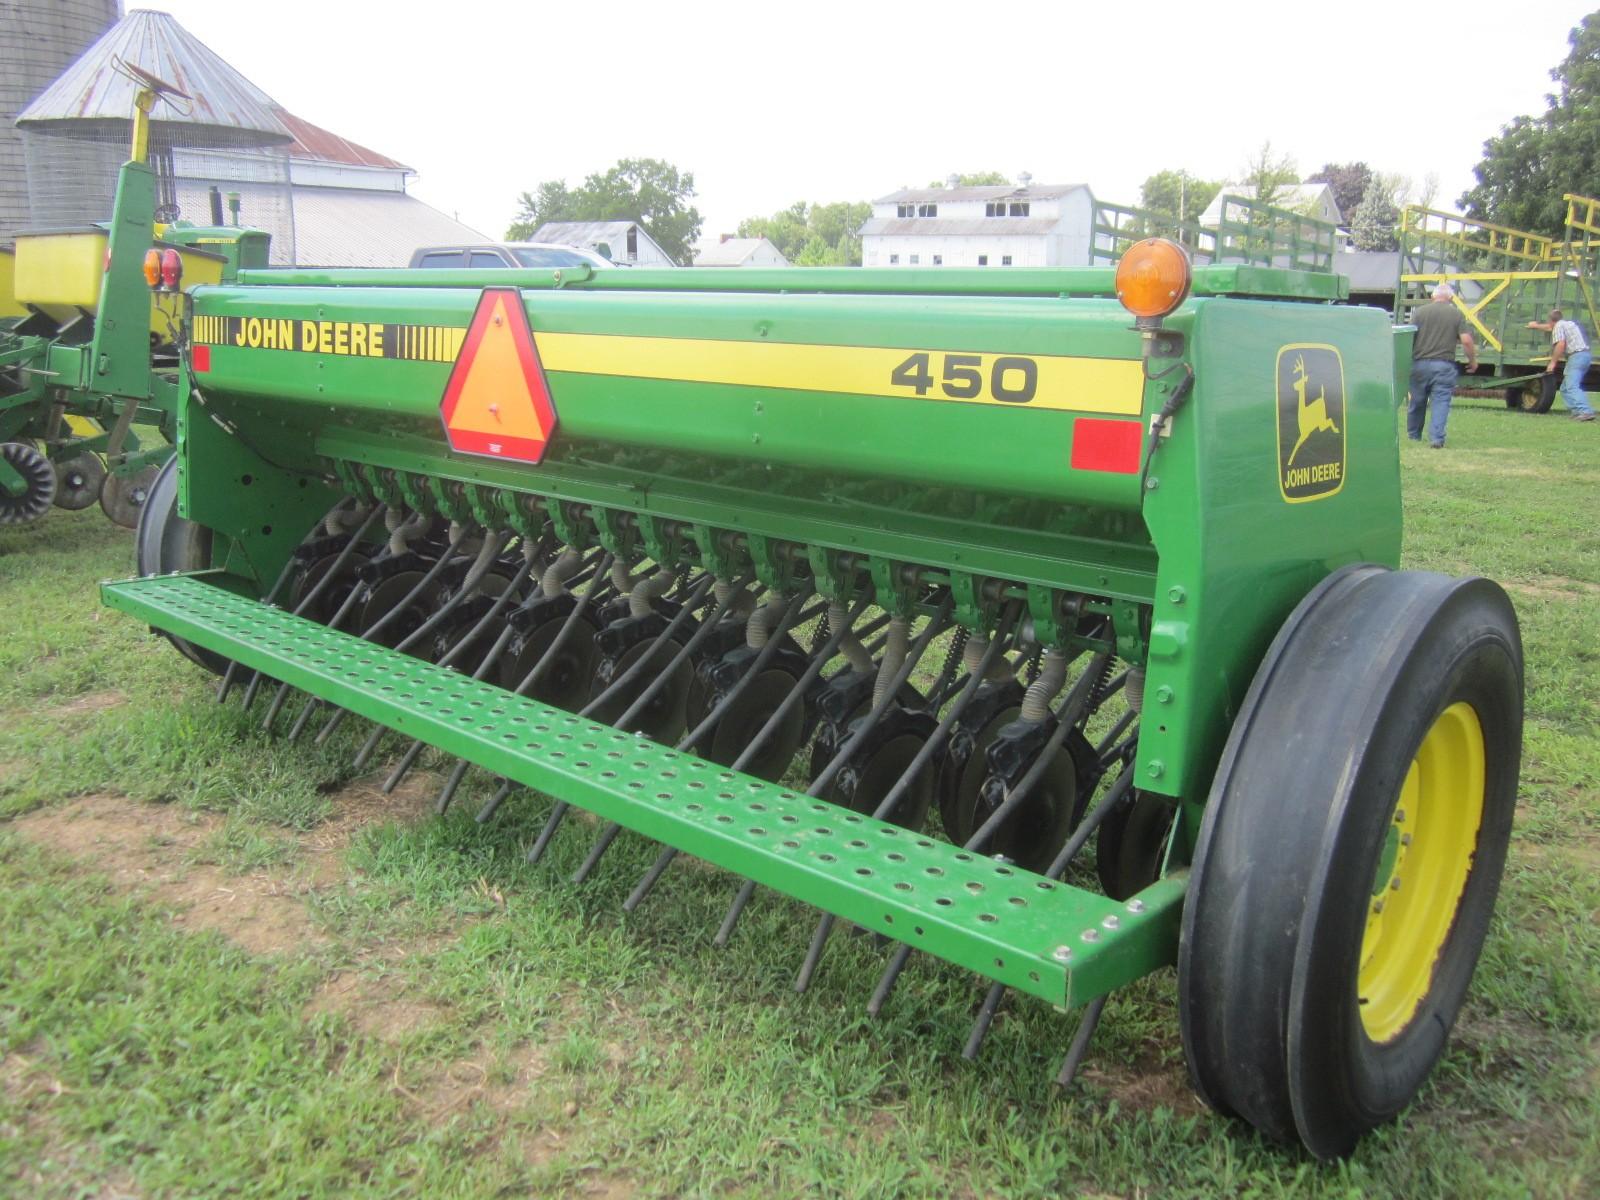 John Deere 450 drill - Farm Equipment